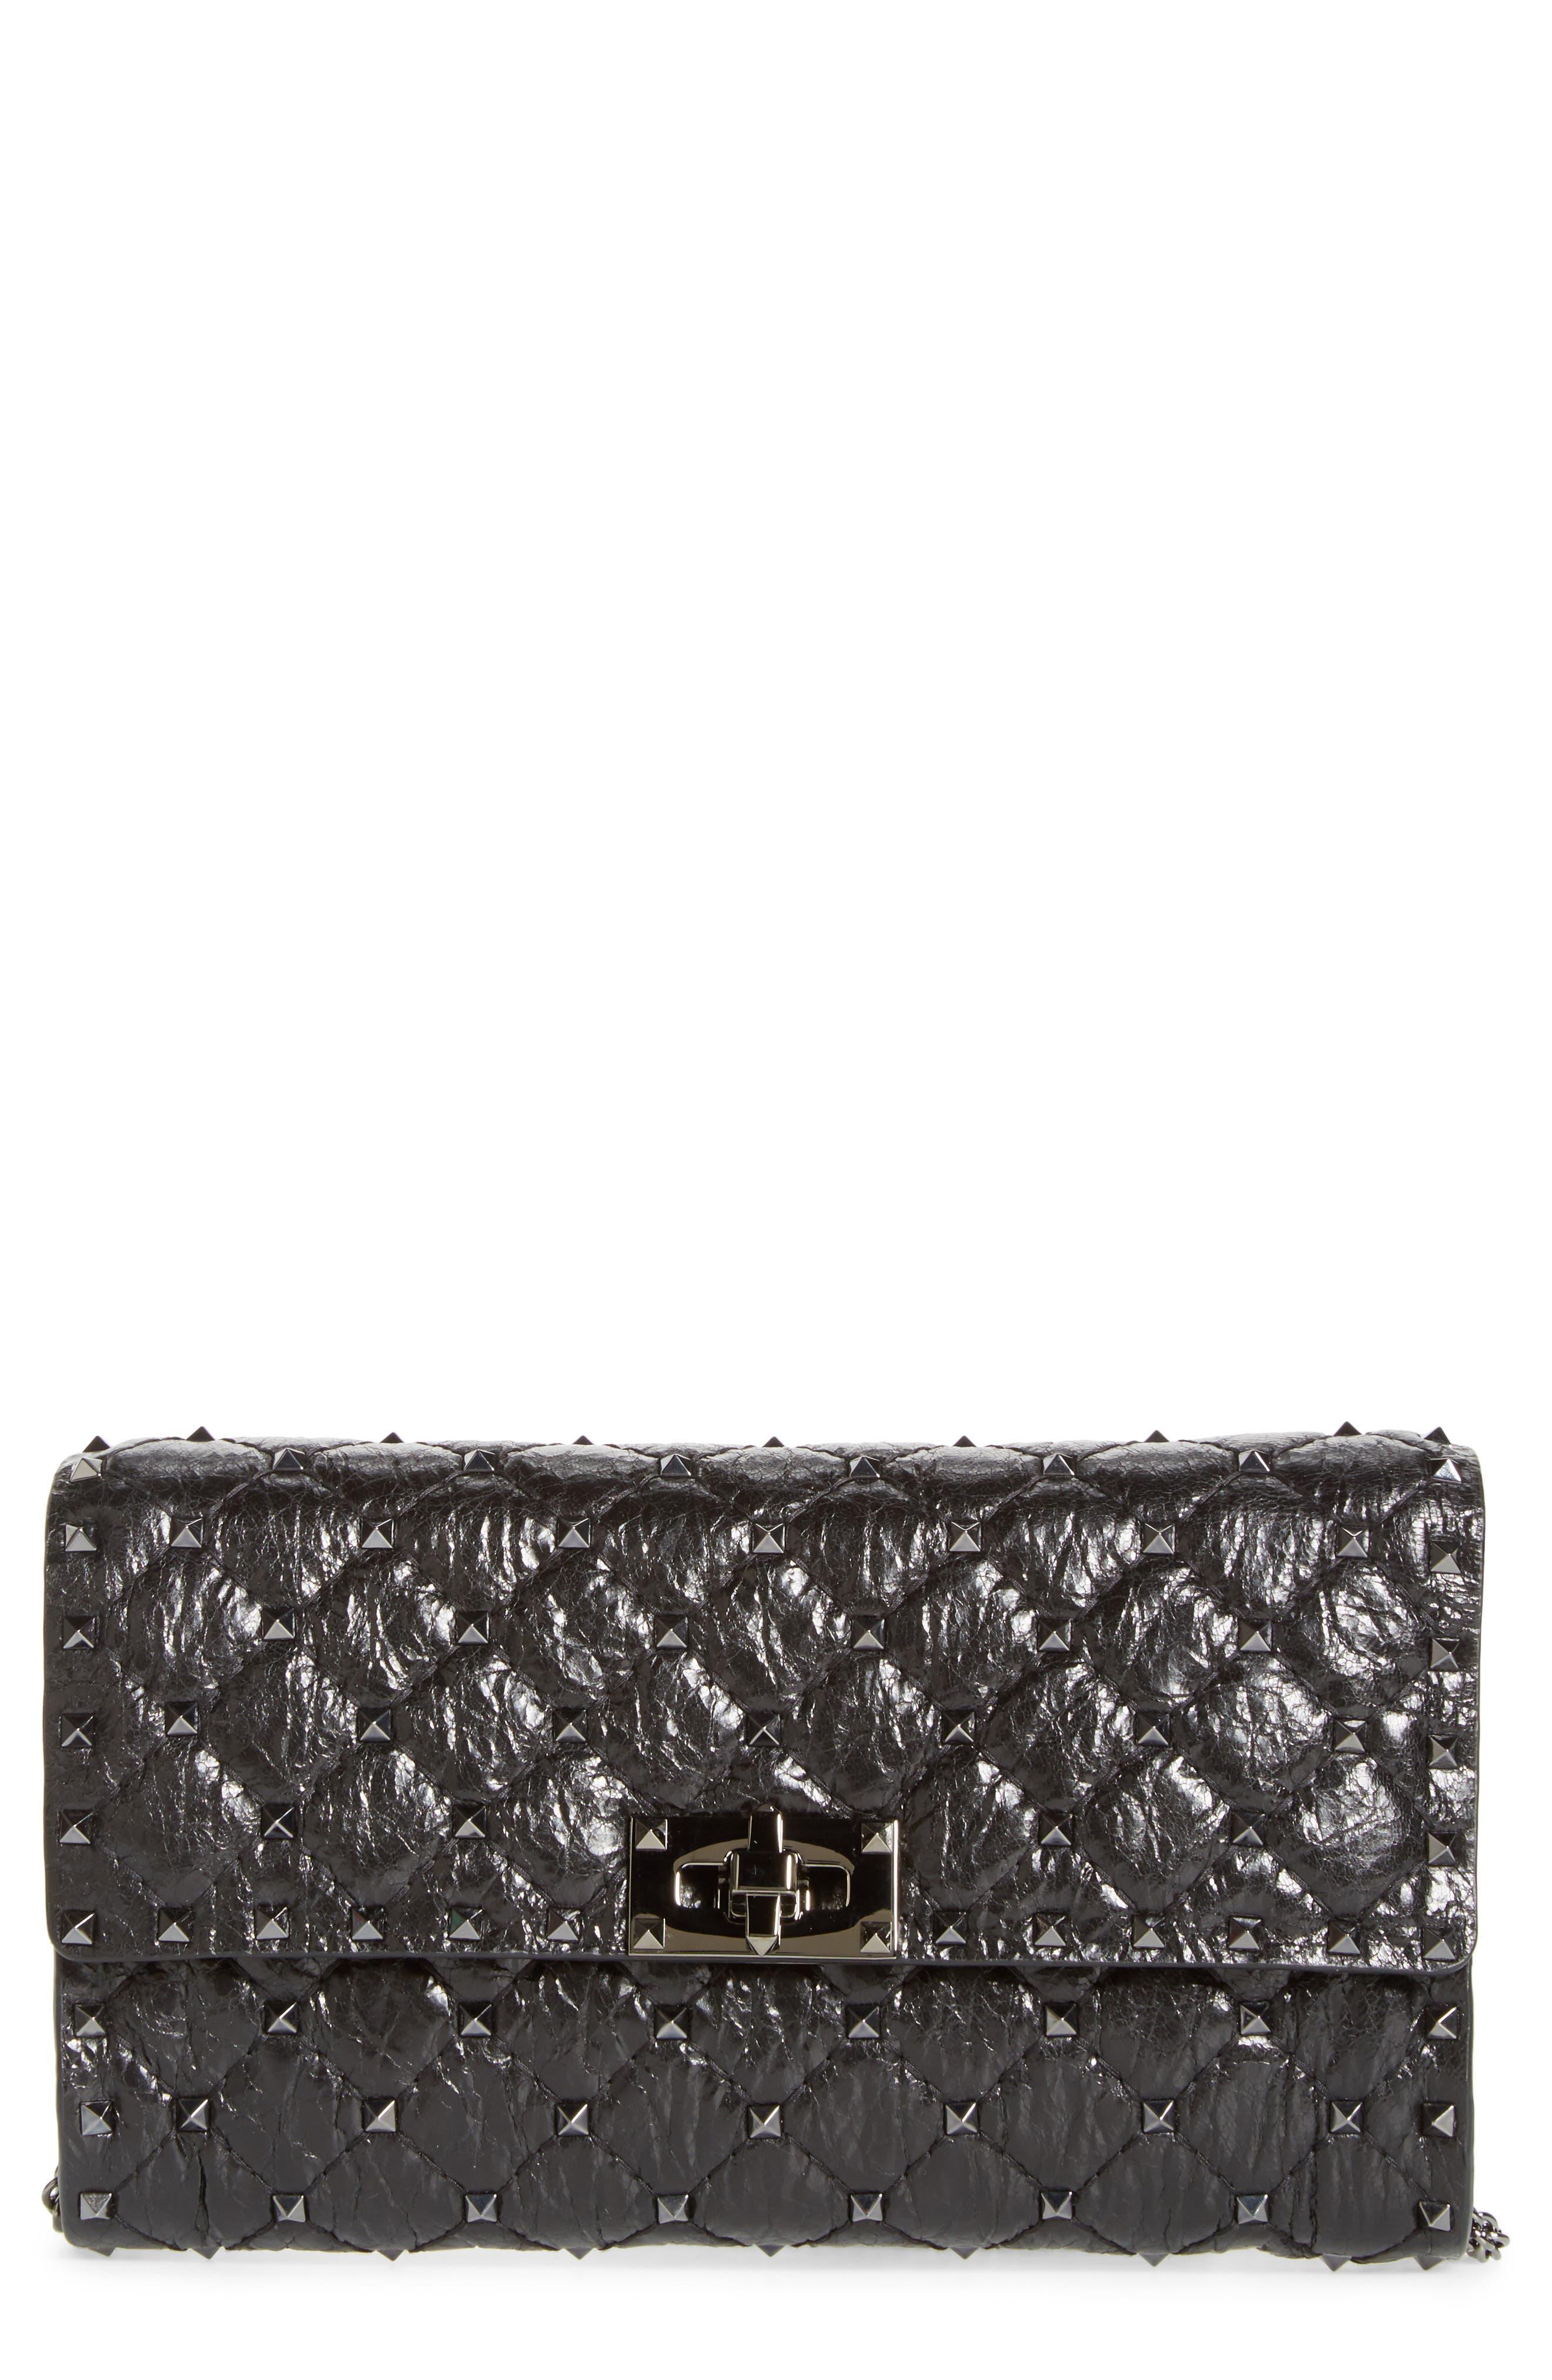 Main Image - VALENTINO GARAVANI Matelassé Rockstud Spike Leather Wallet on a Chain